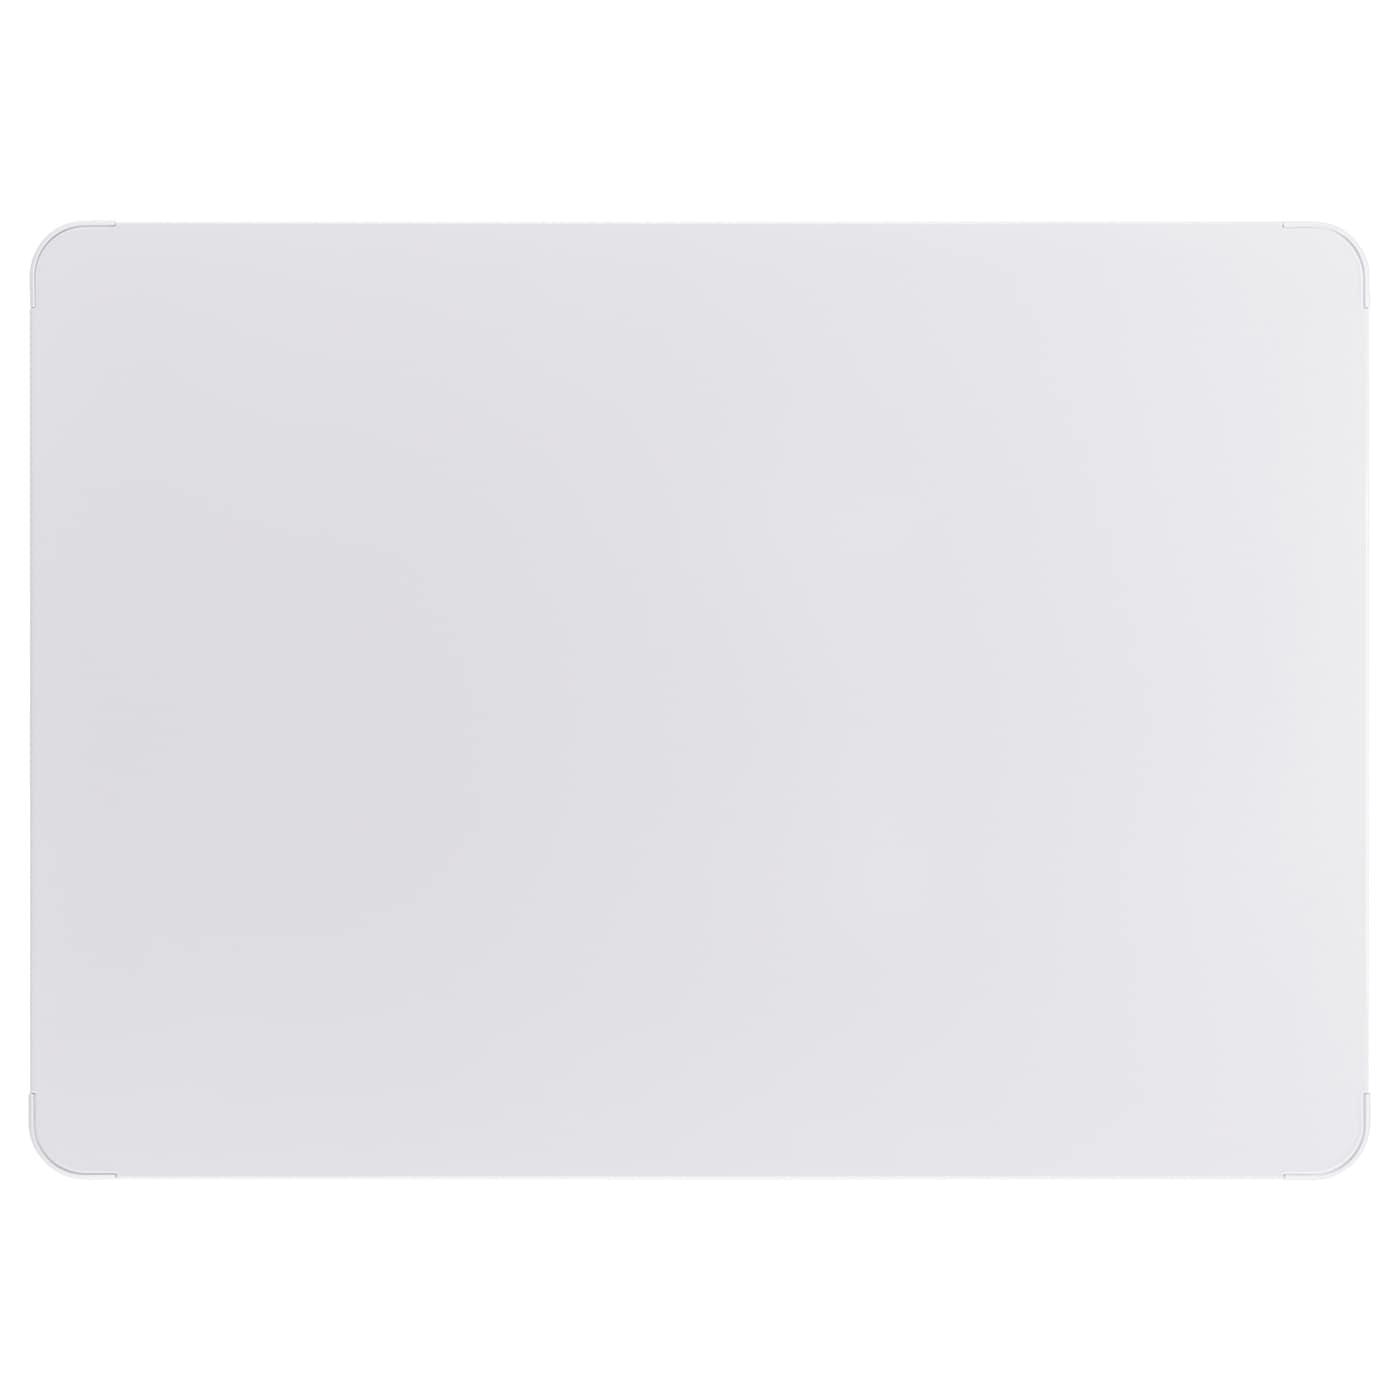 vemund whiteboard magnetic board white 70x50 cm ikea. Black Bedroom Furniture Sets. Home Design Ideas